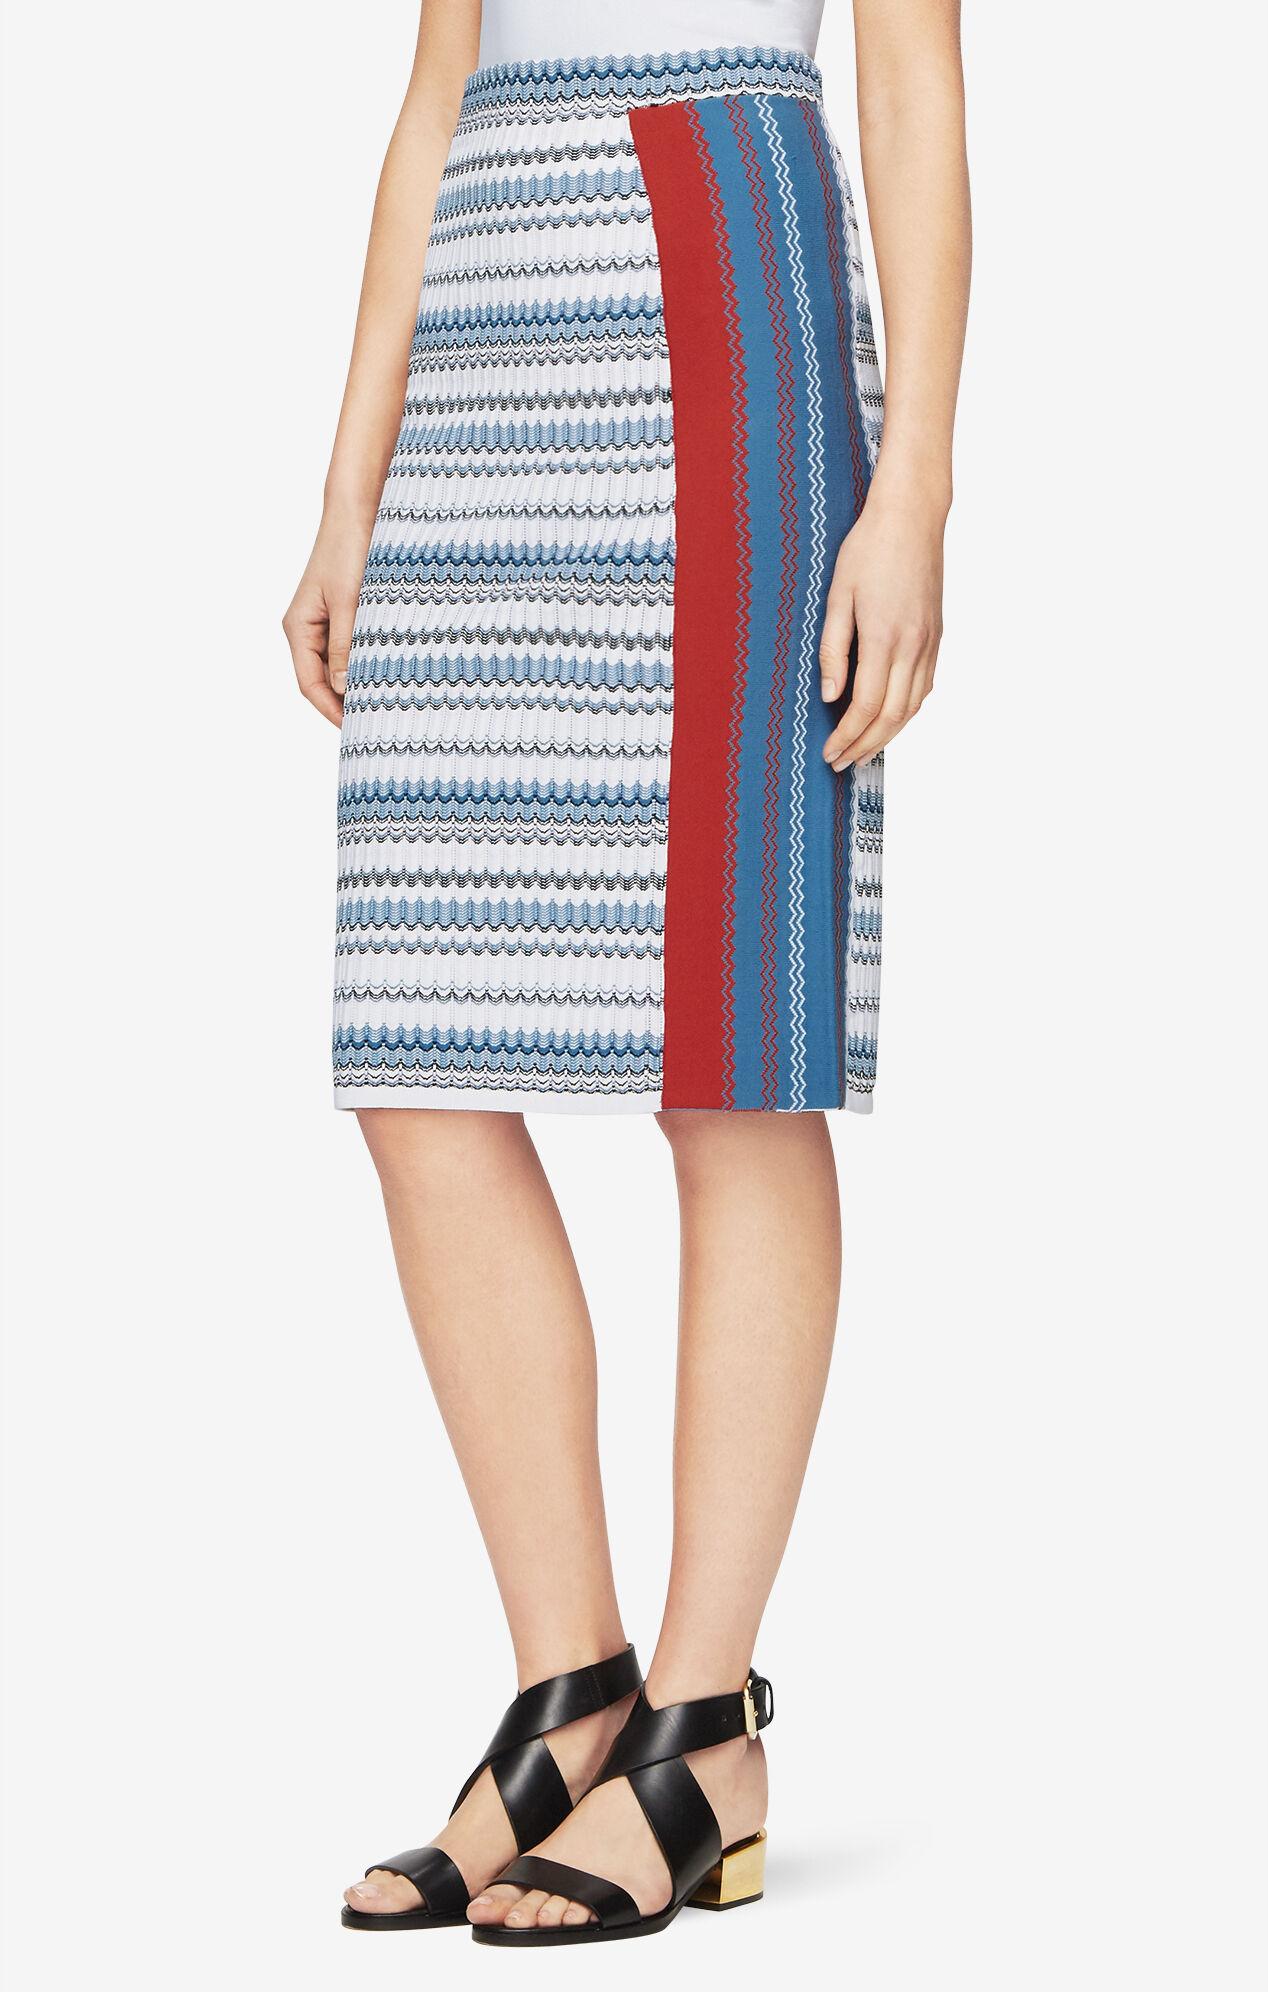 pencil line skirt dress ala